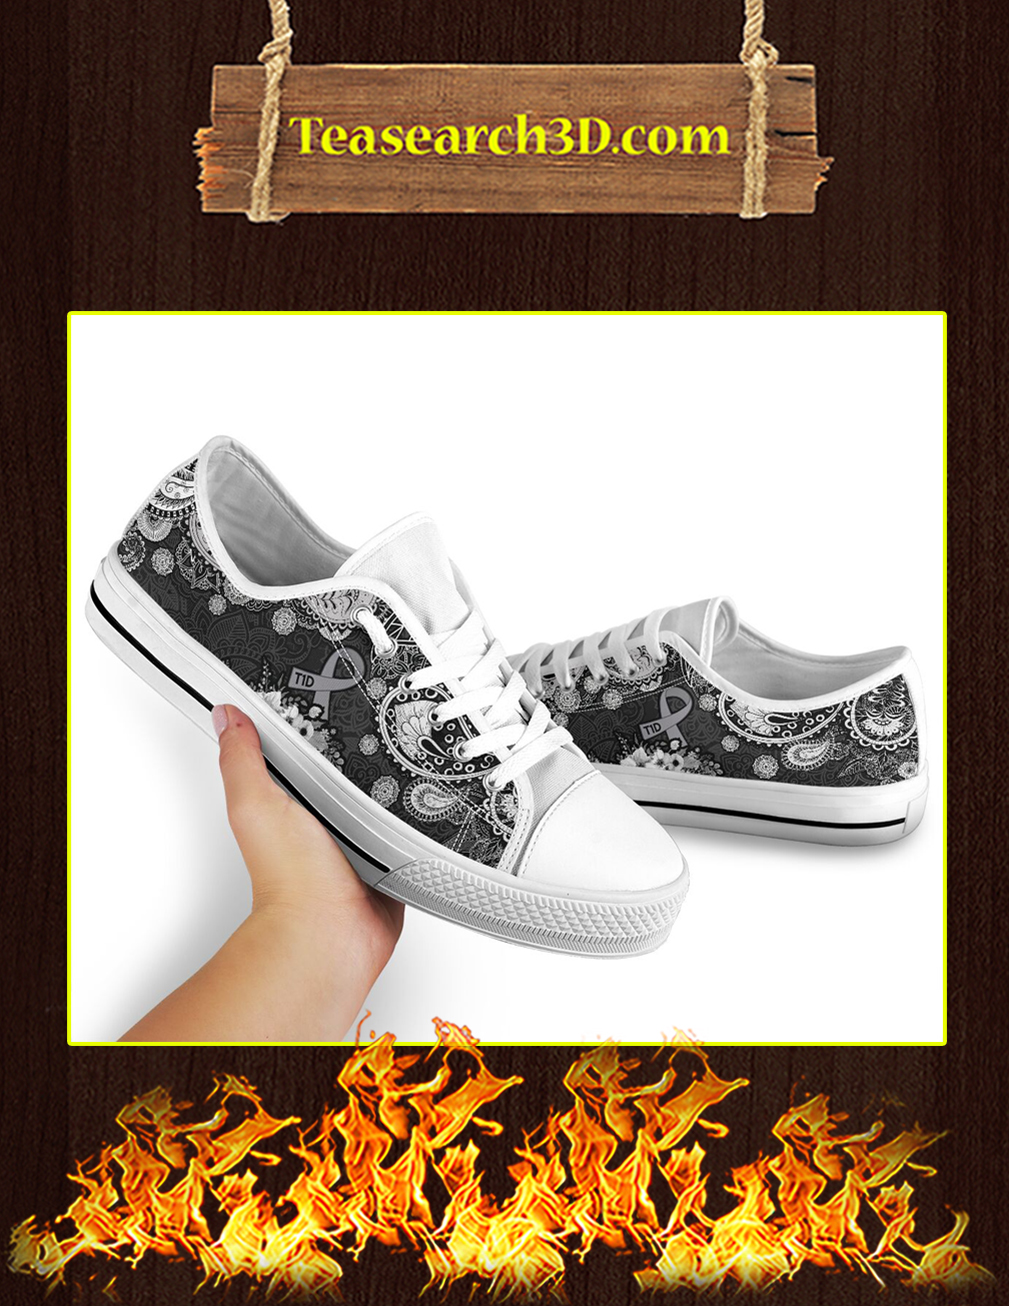 T1D Low Top Shoes Pic 2